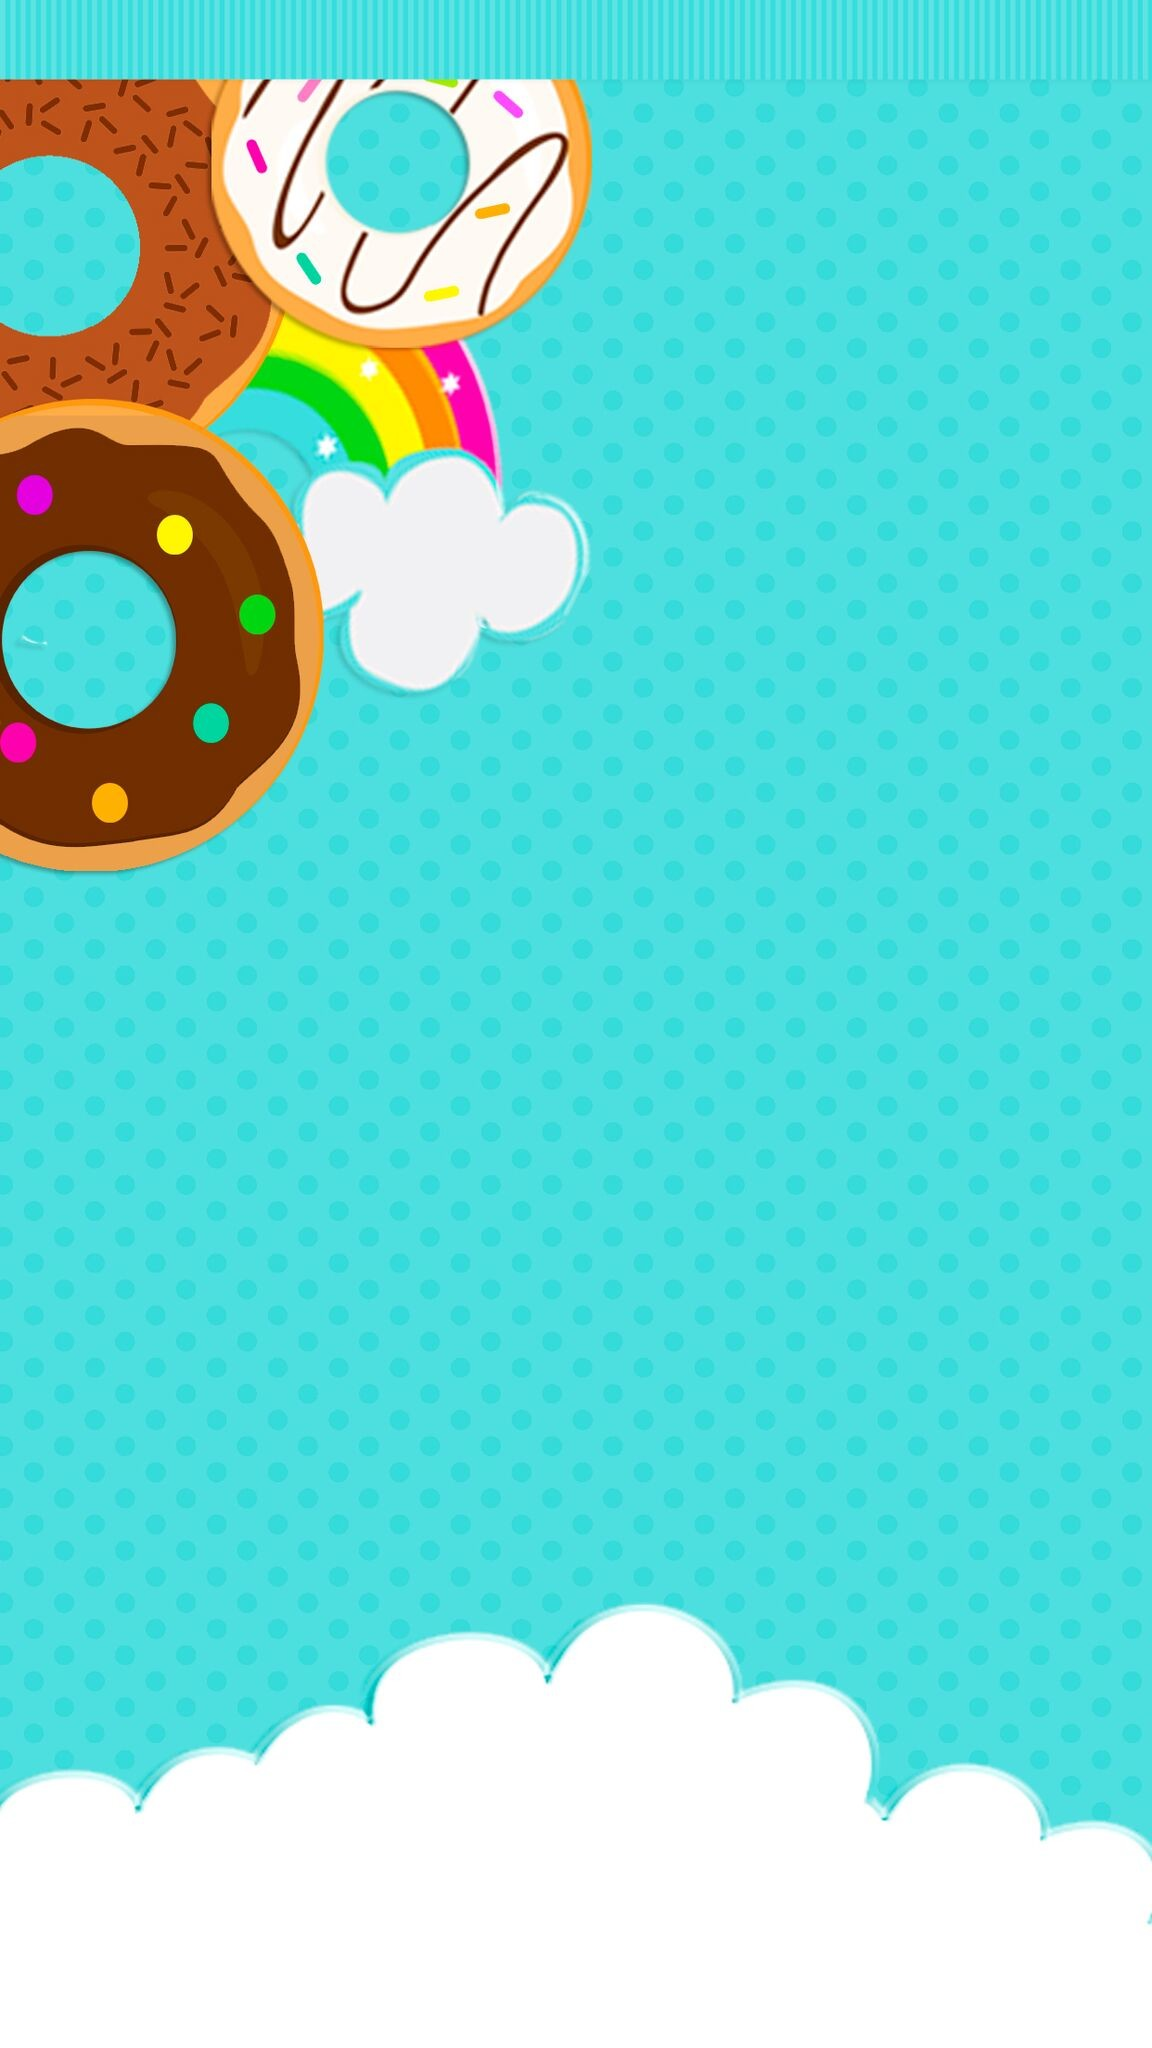 iPhone Wall: Yummy tjn